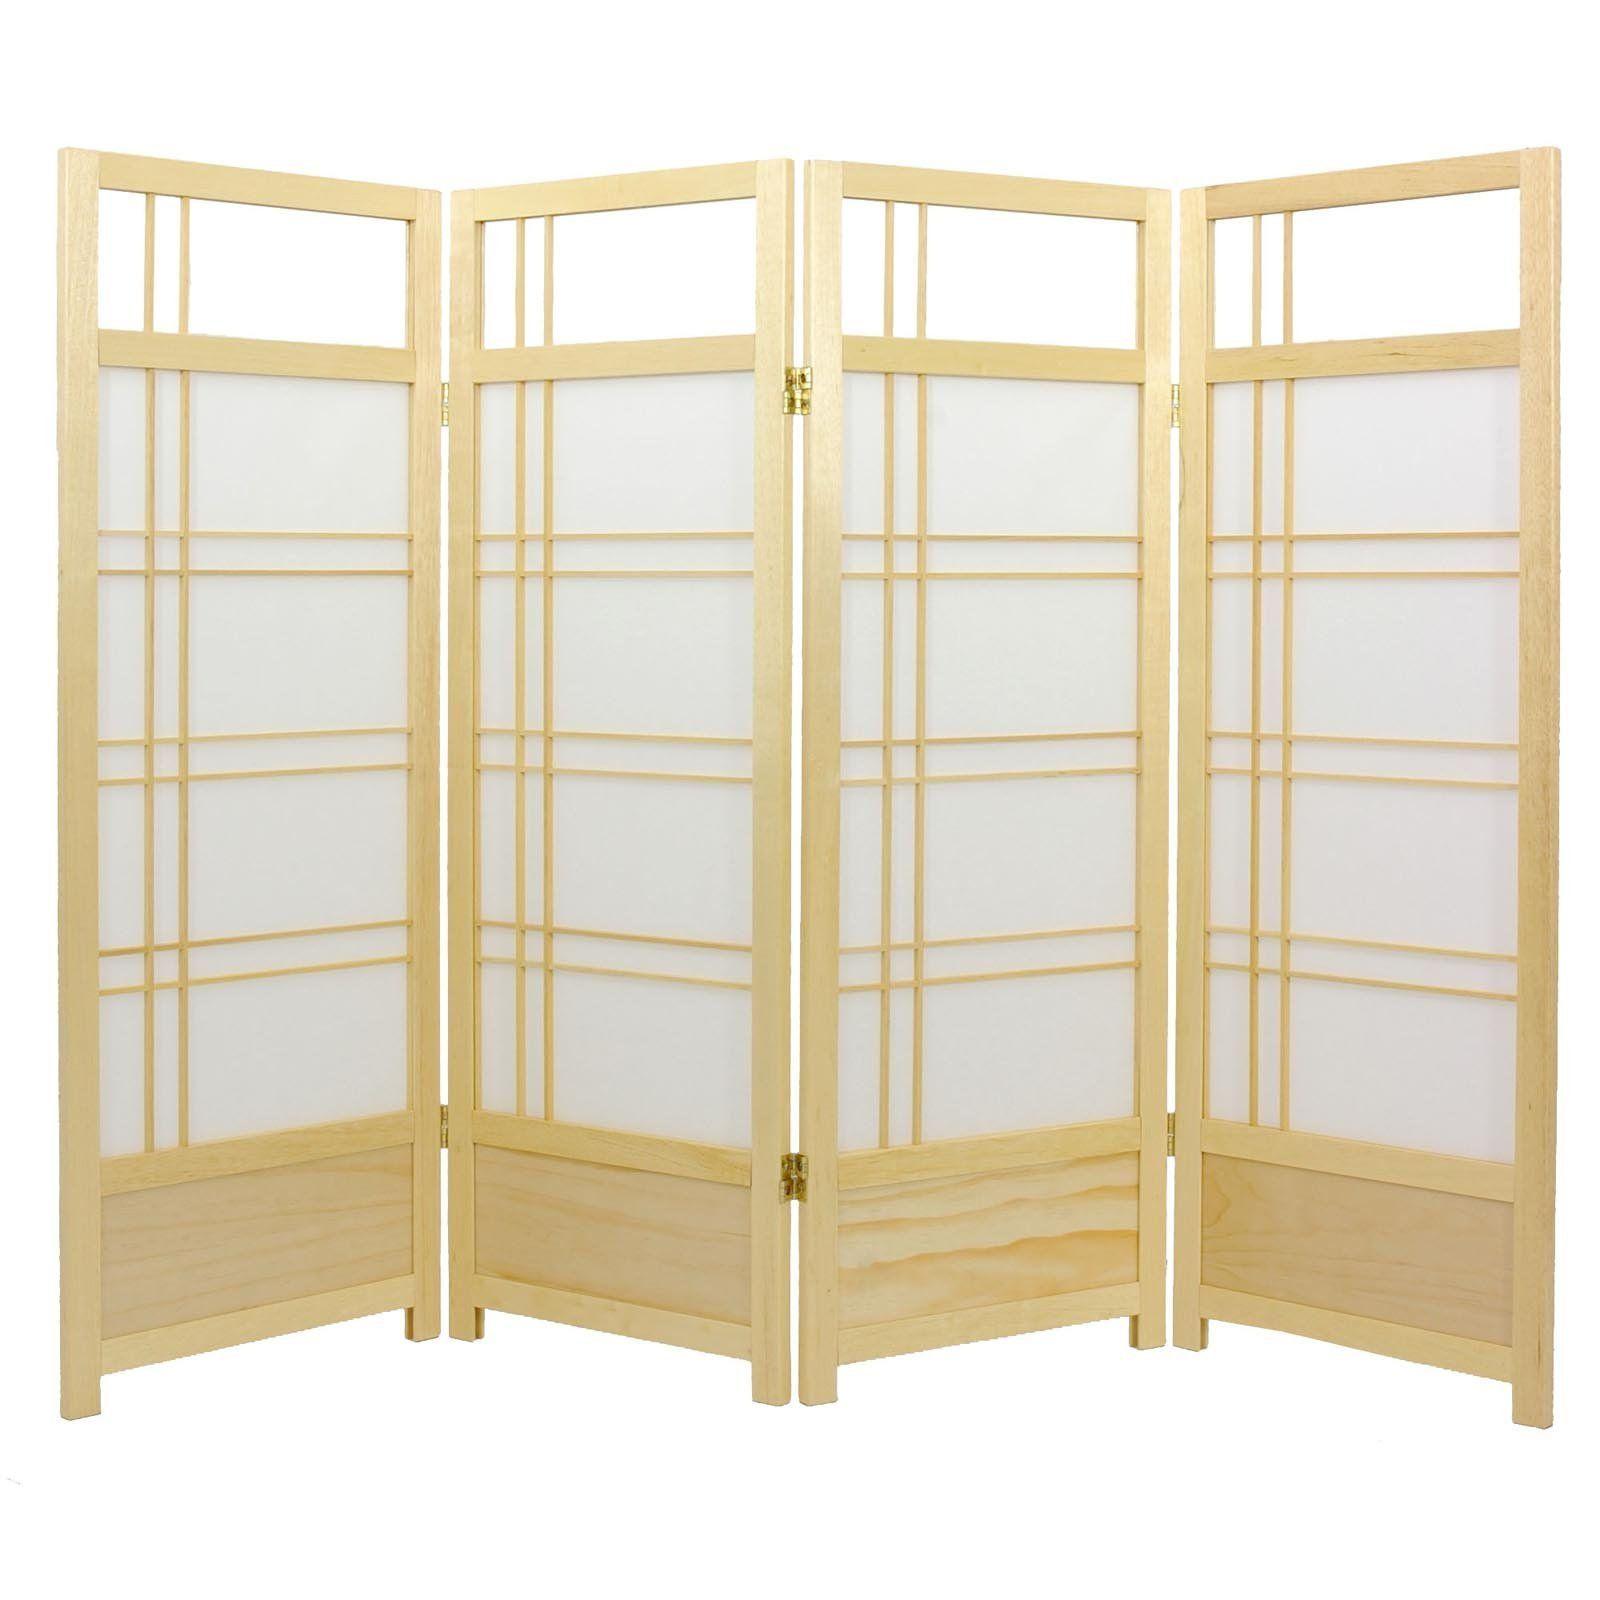 Kumo low screen room divider inch foldingroomdivider room